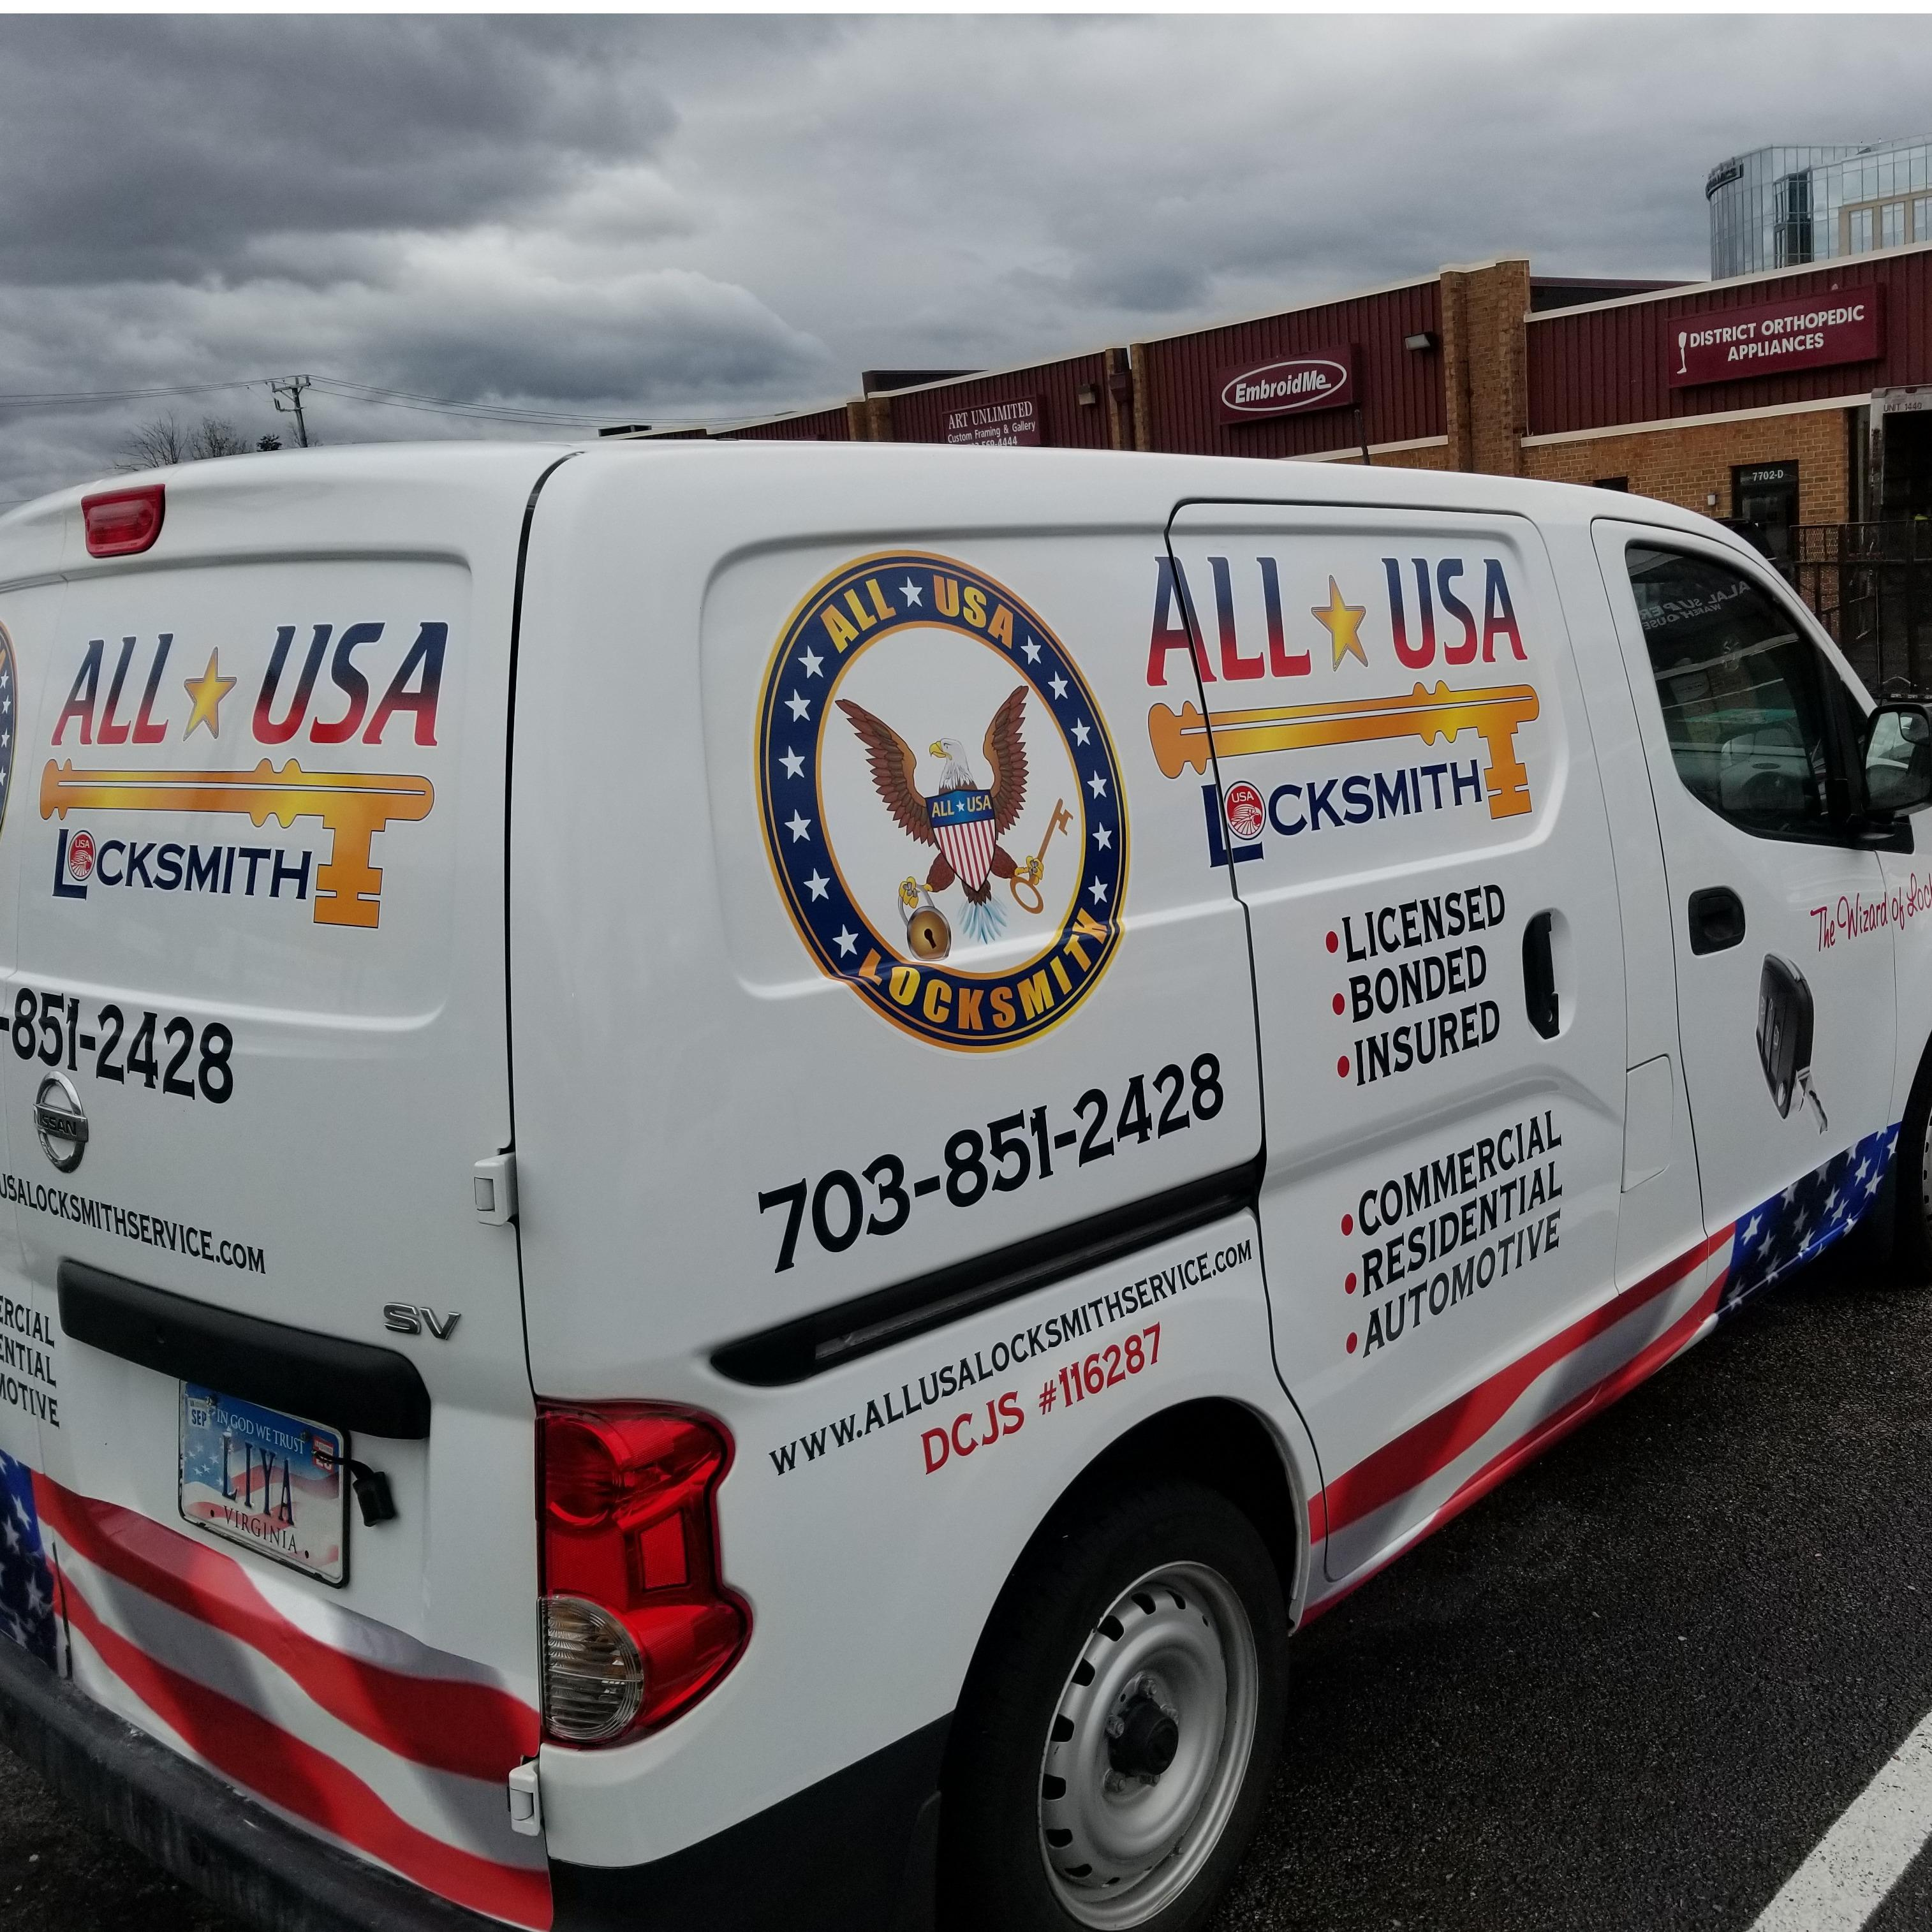 All USA Locksmith